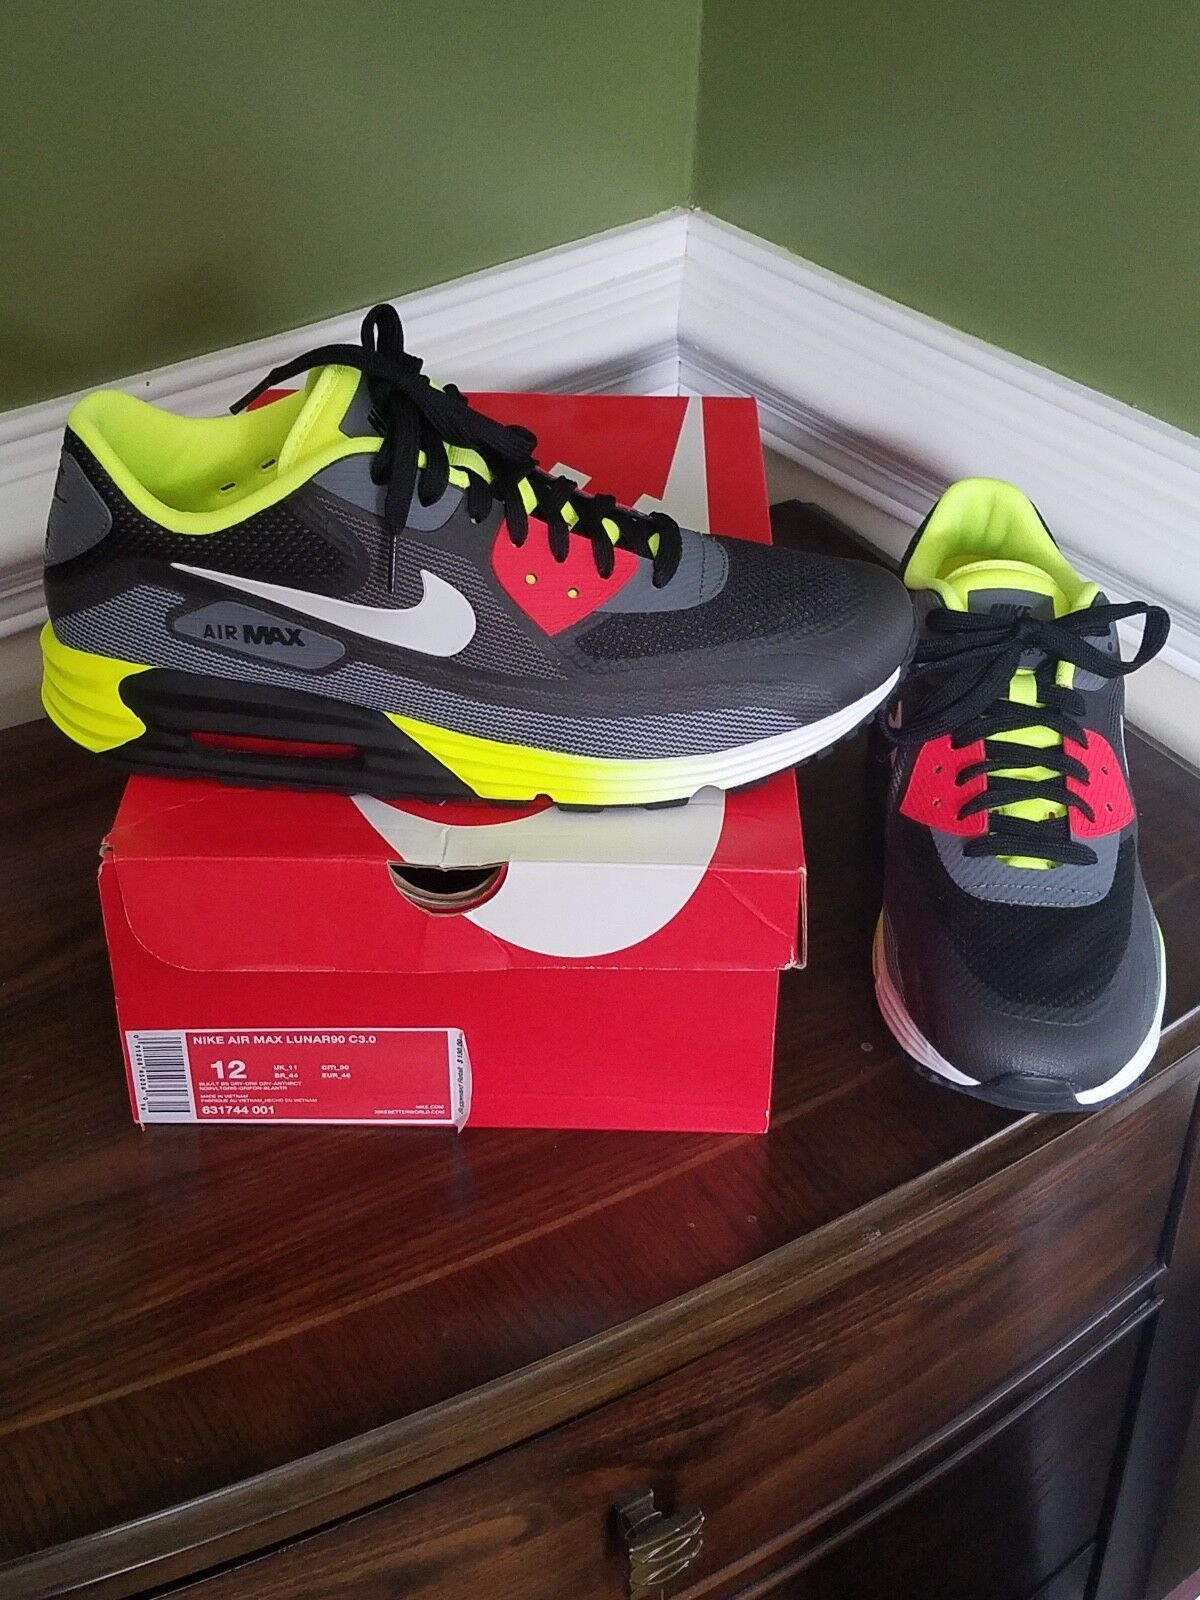 Nike lunare air max 90 c3.0 lunare Nike